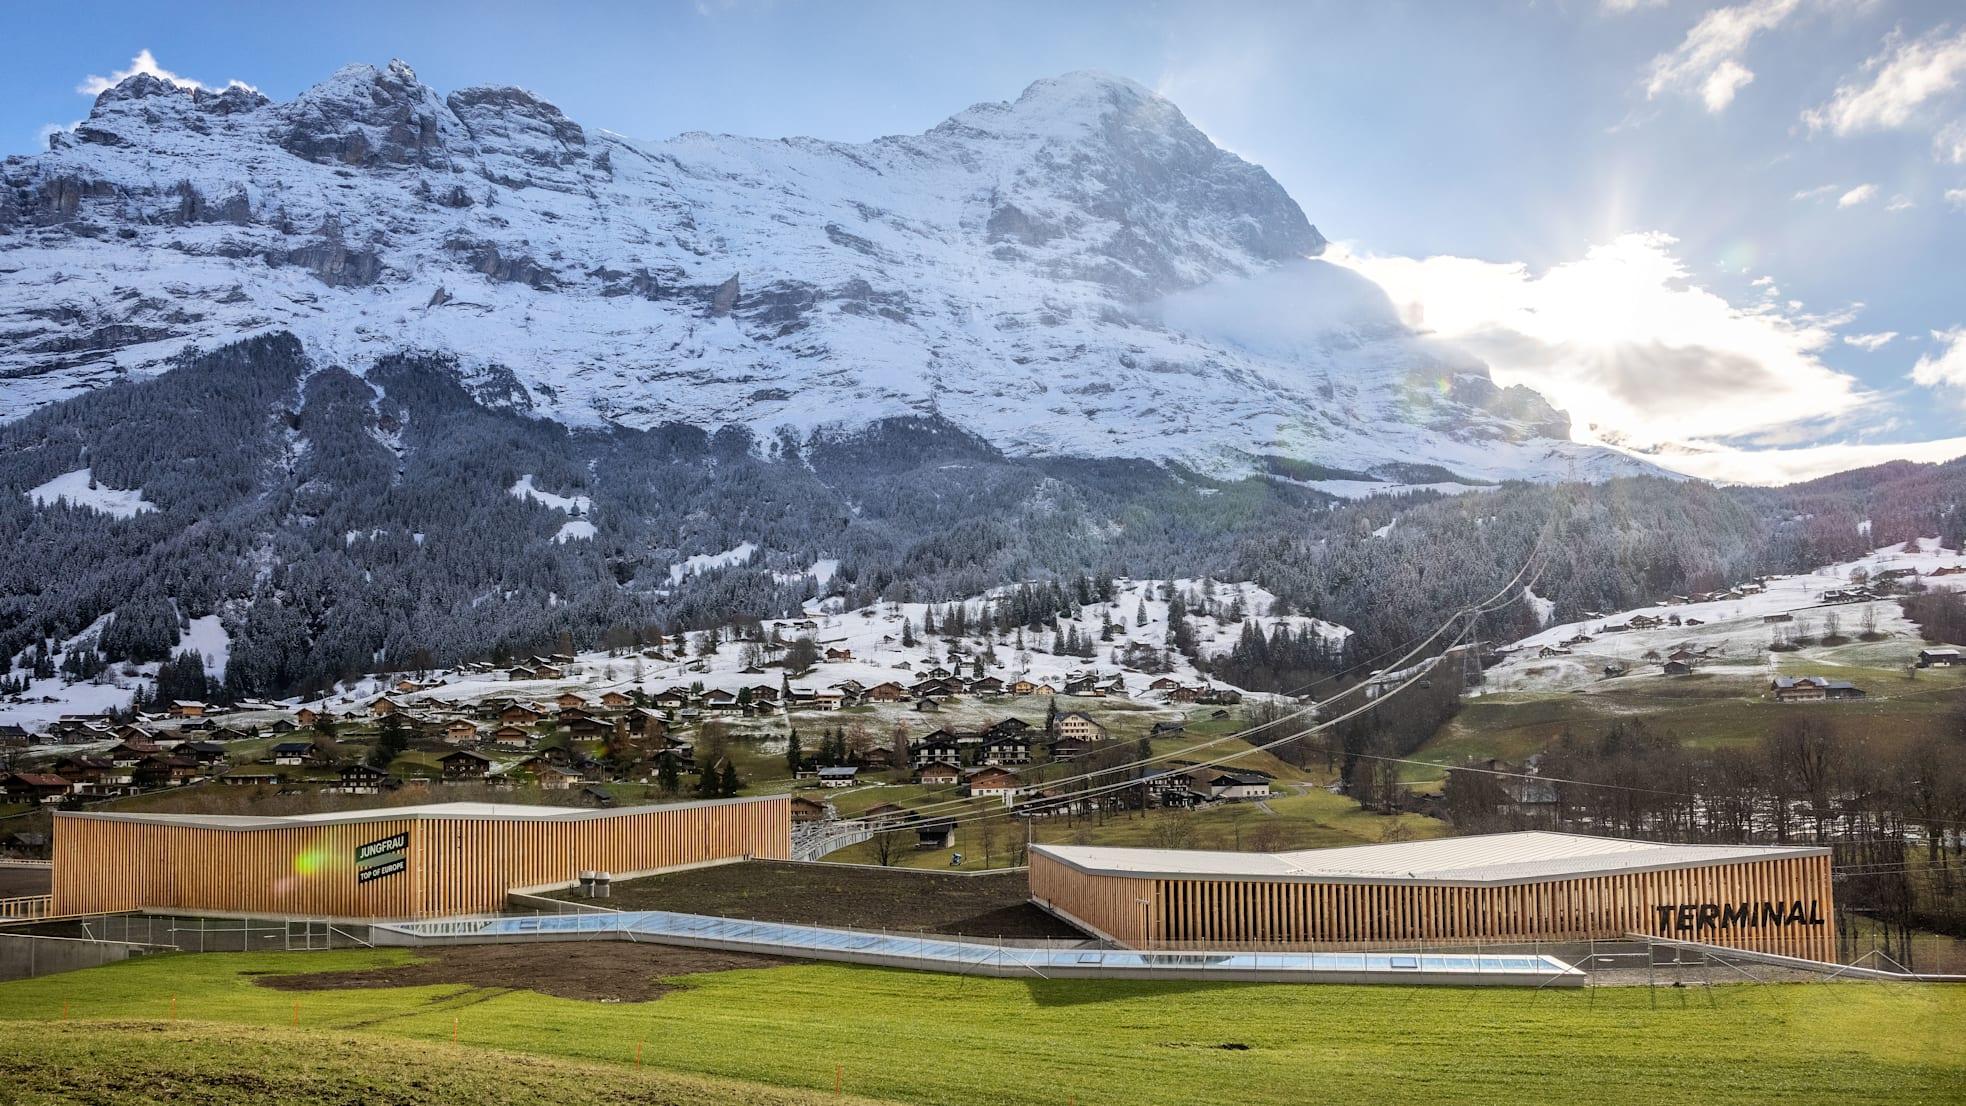 Cable car, aerial gondola, winter, gondola, Switzerland, Bernese Oberland, Jungfrau, jungfrau railways, Eiger, Grindelwald, v-cableway, tricable gondola, Switzerland, November, cable car, terminal, transport